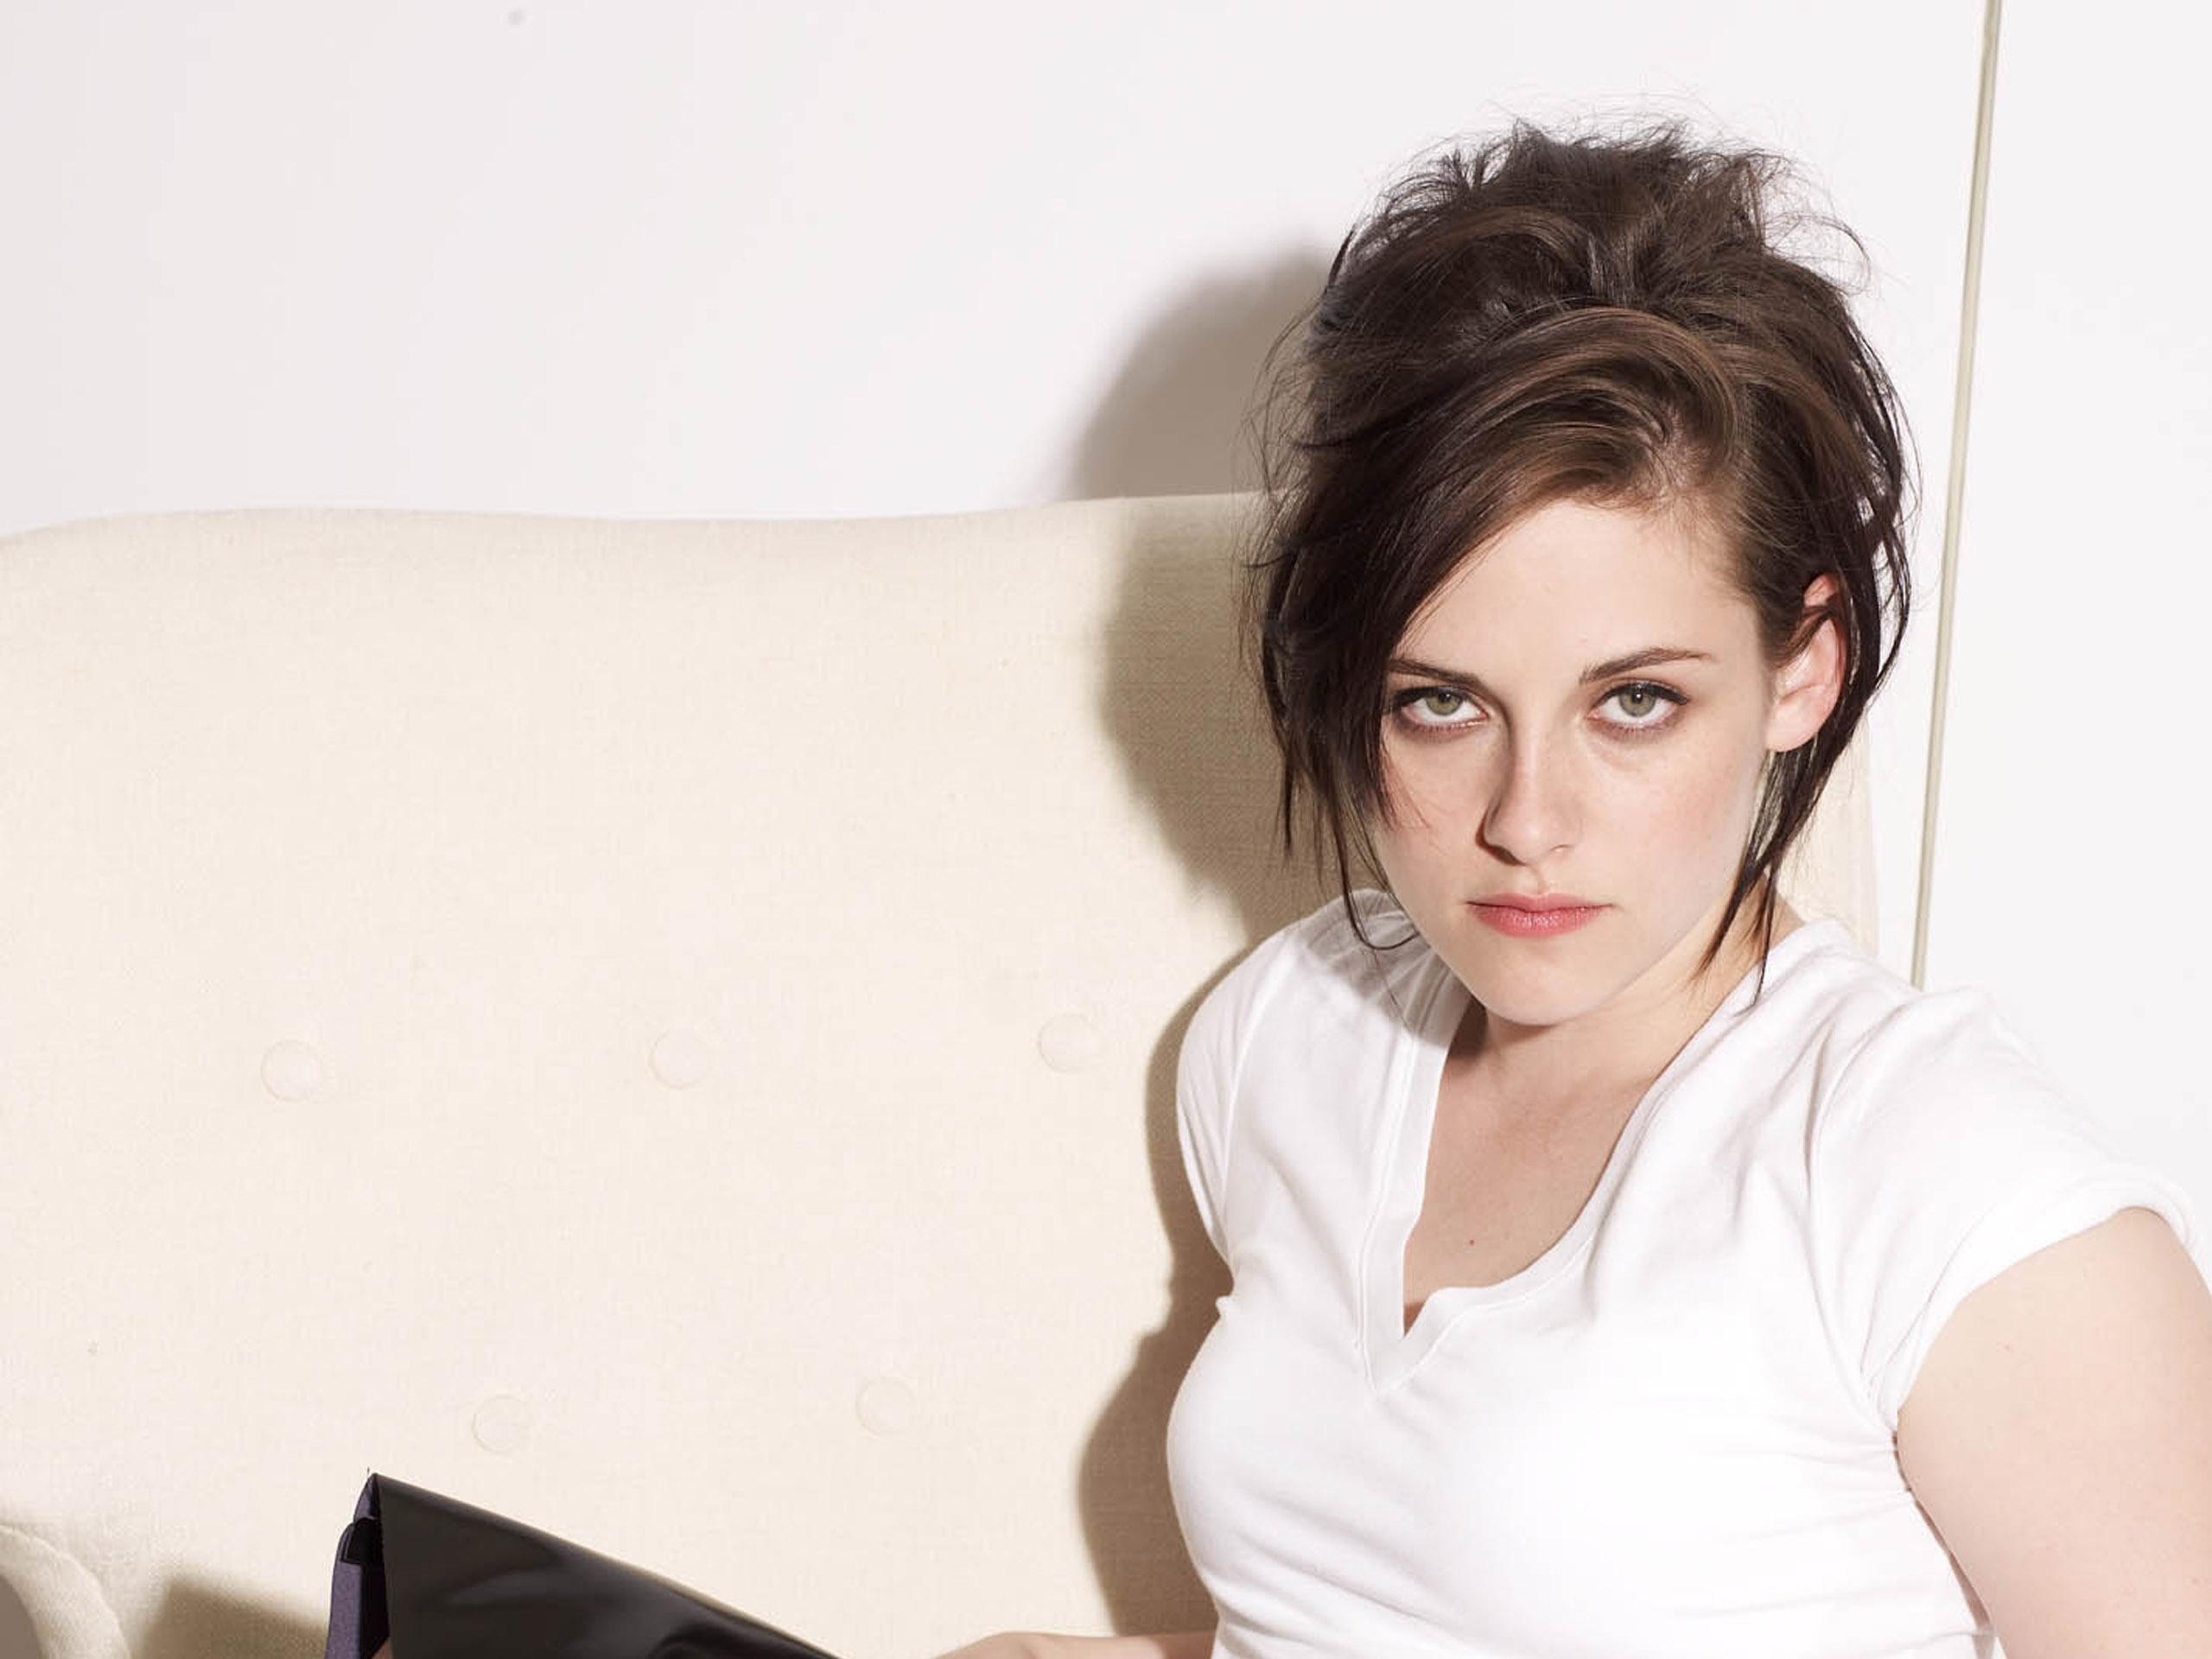 Kristen Stewart Hair Style Wallpaper